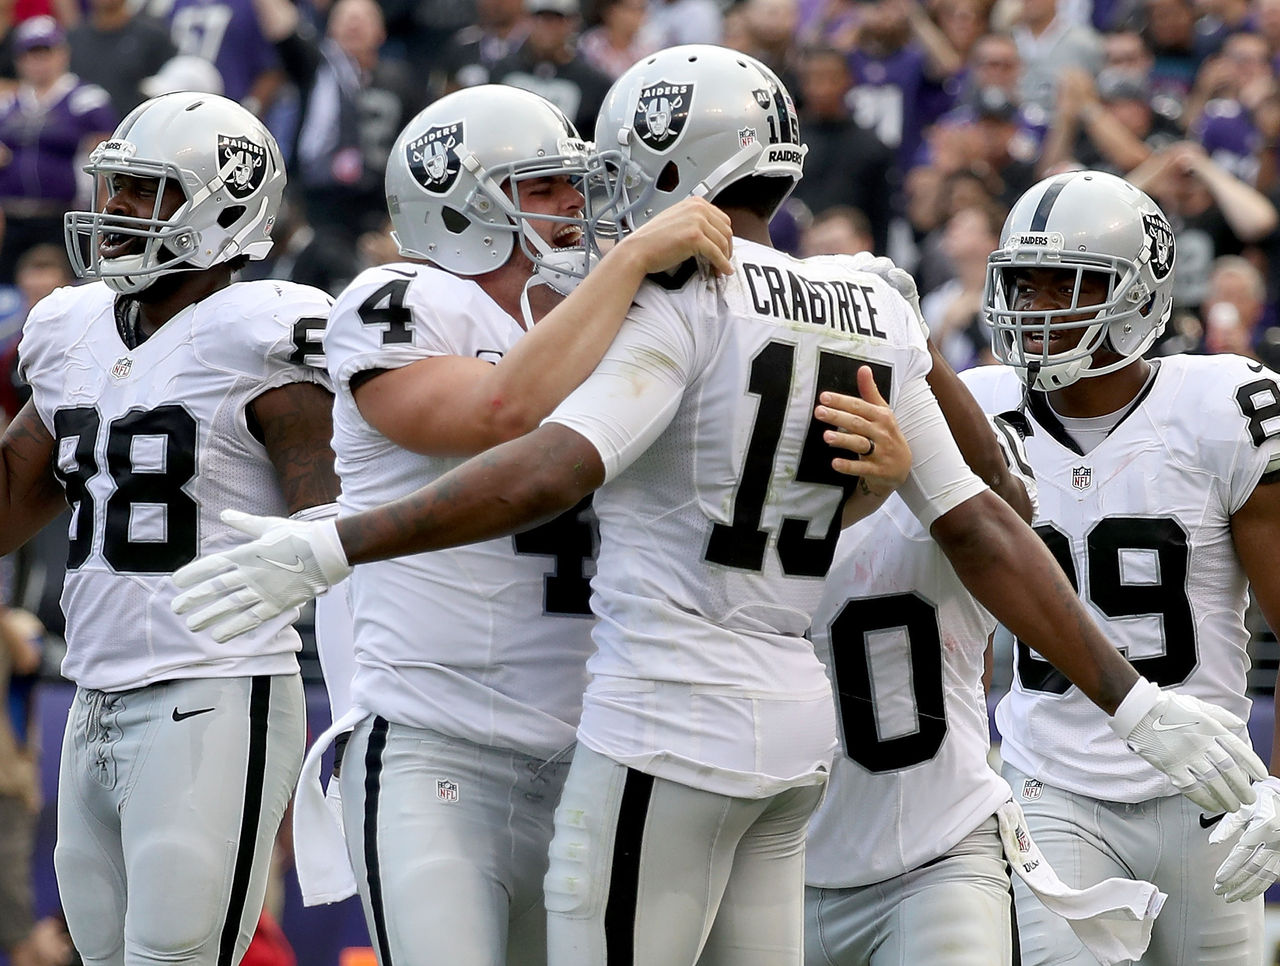 [NFL] Week 4: Altalena di emozioni (Oakland Raiders vs Baltimore Ravens 28-27)